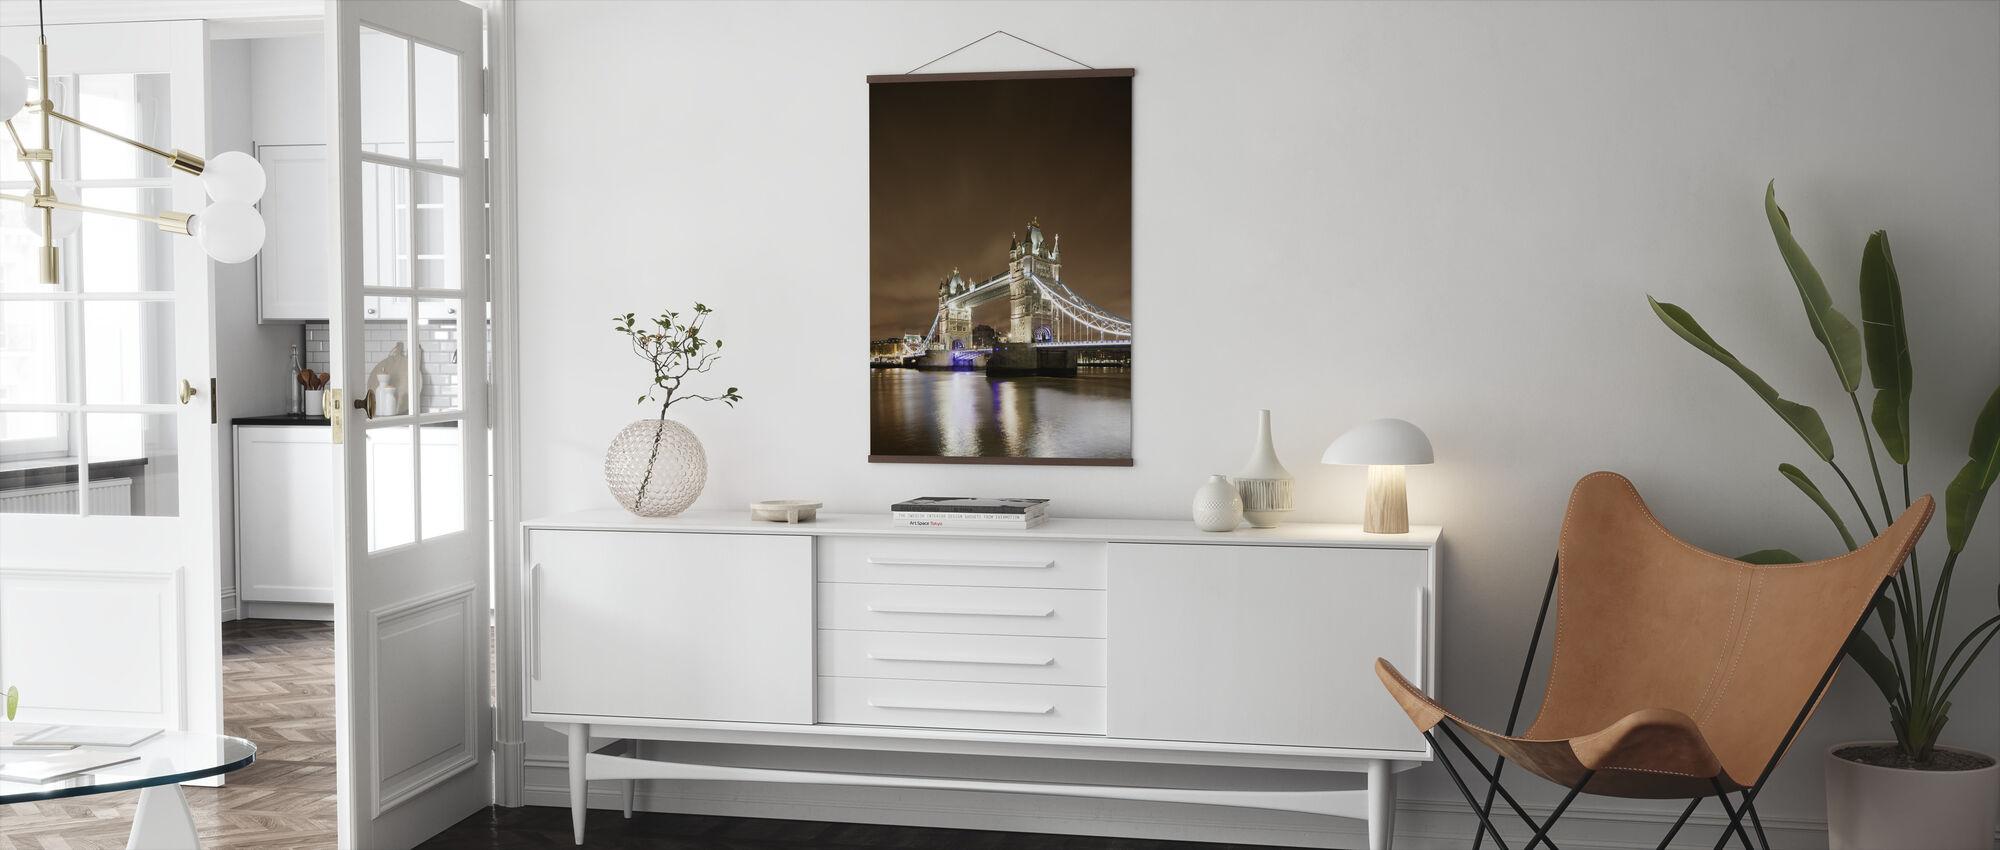 Tower Bridge - Purple Light - Poster - Living Room